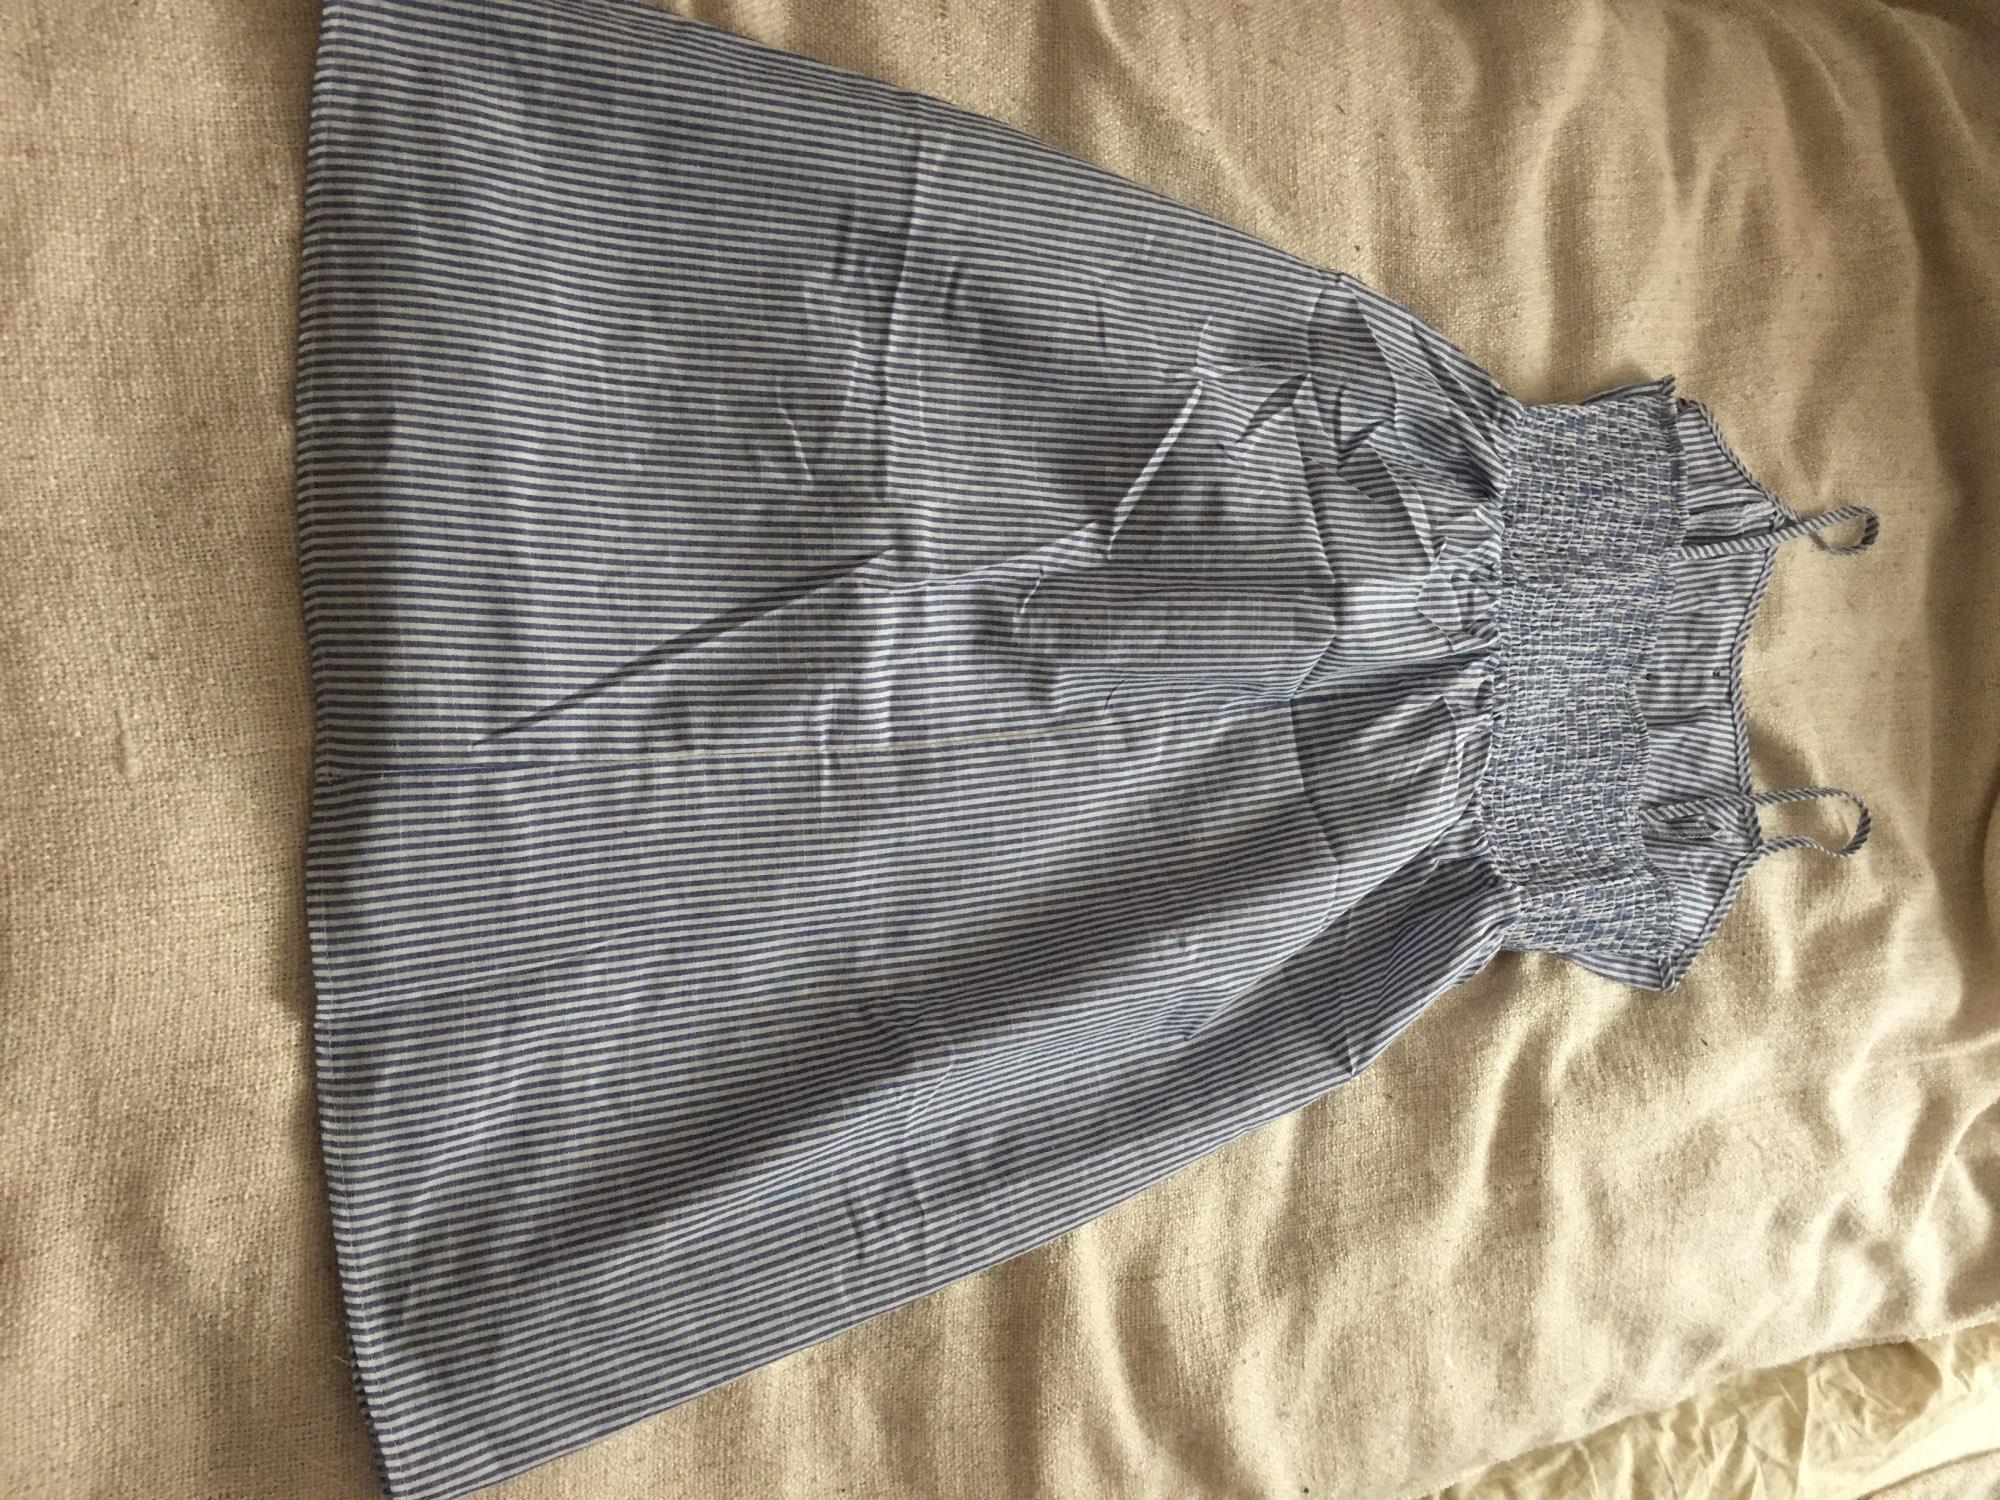 Vintage Casual Sundress Female Beach Dress Midi Button Backless Polka Dot Striped Women Dress Summer 2021 Boho Sexy Floral Dress|Dresses|   - AliExpress